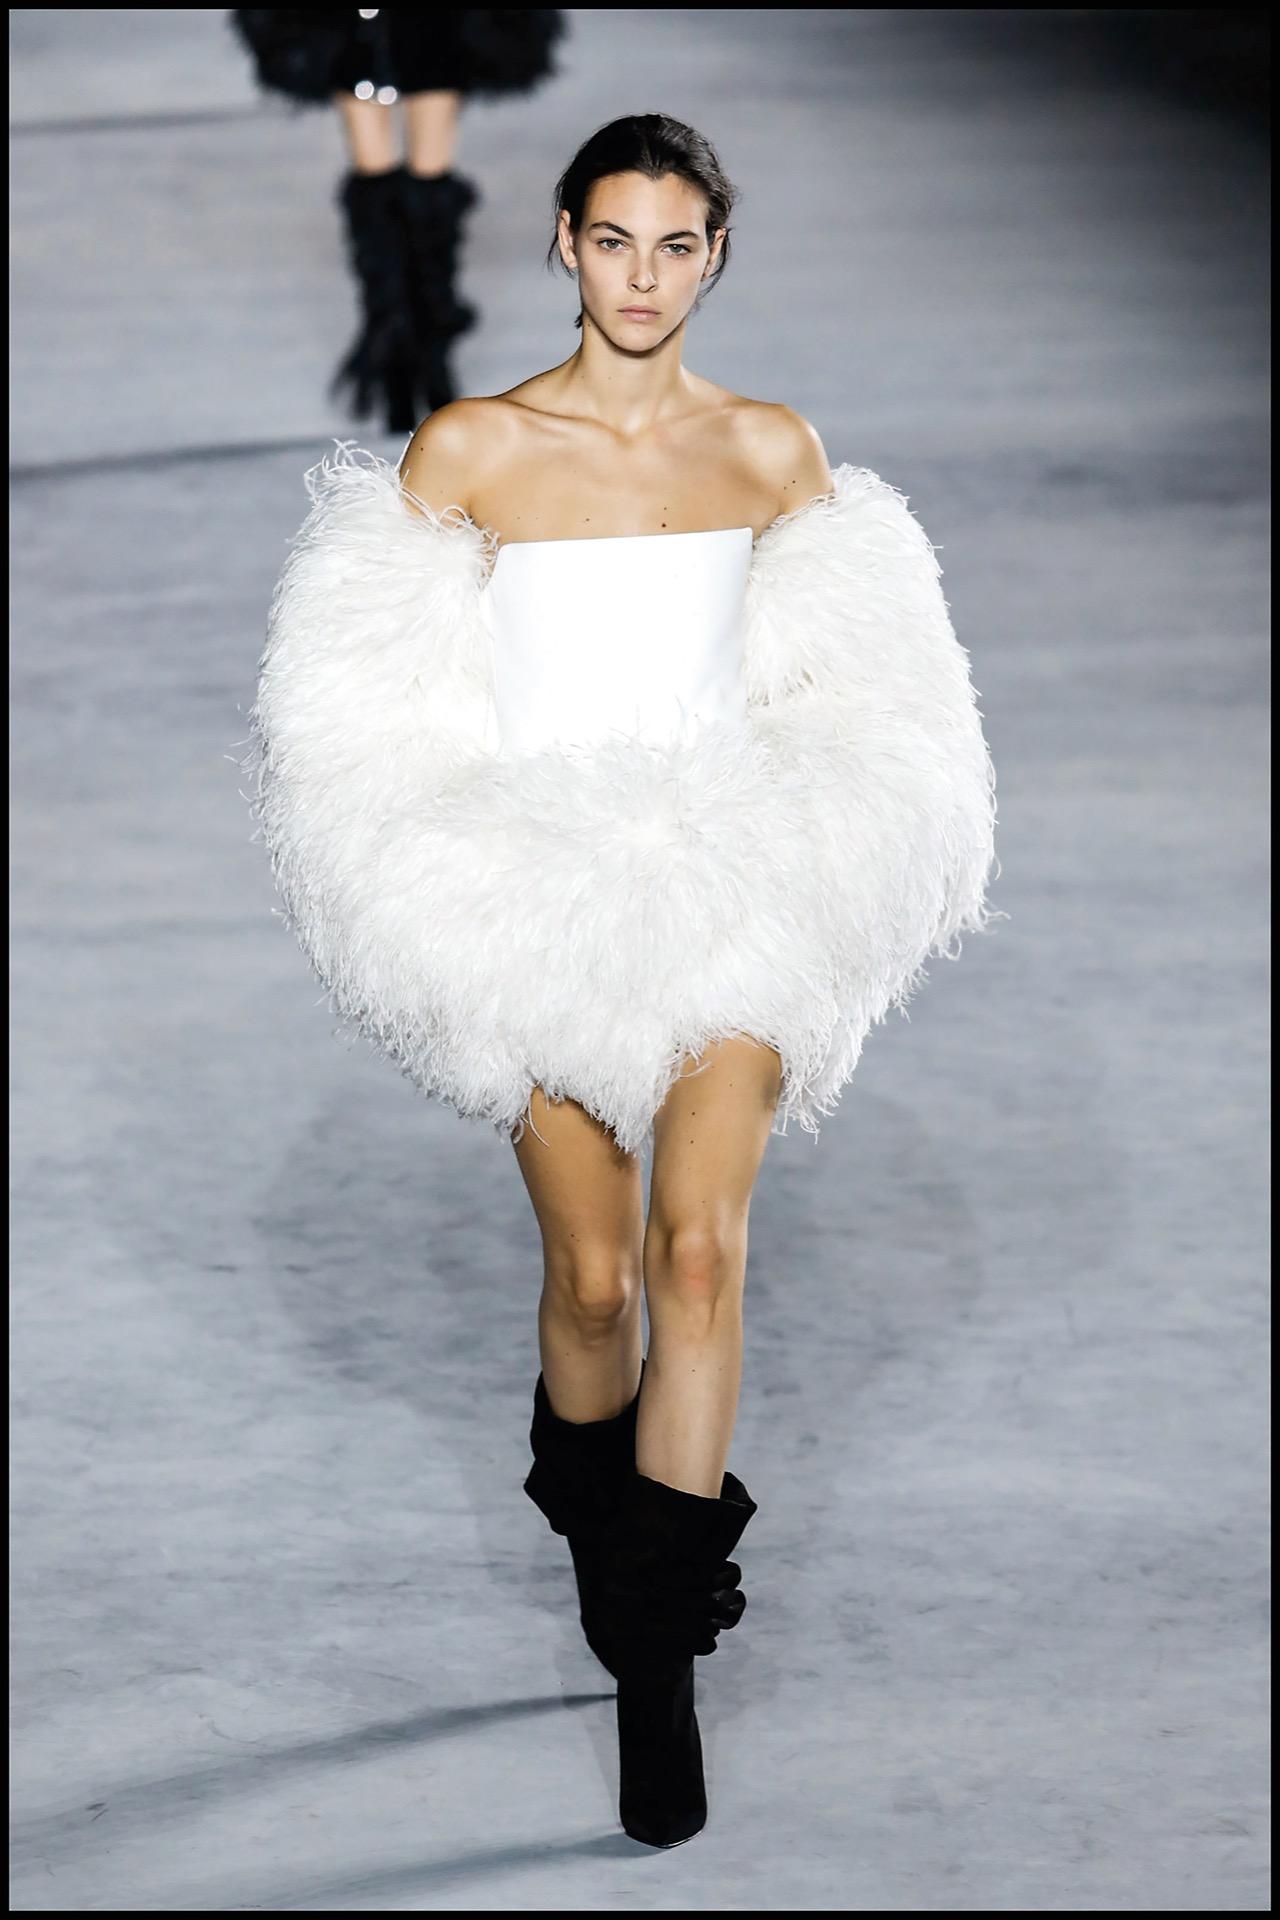 Desfile Saint Laurent con prendas escote Bardot